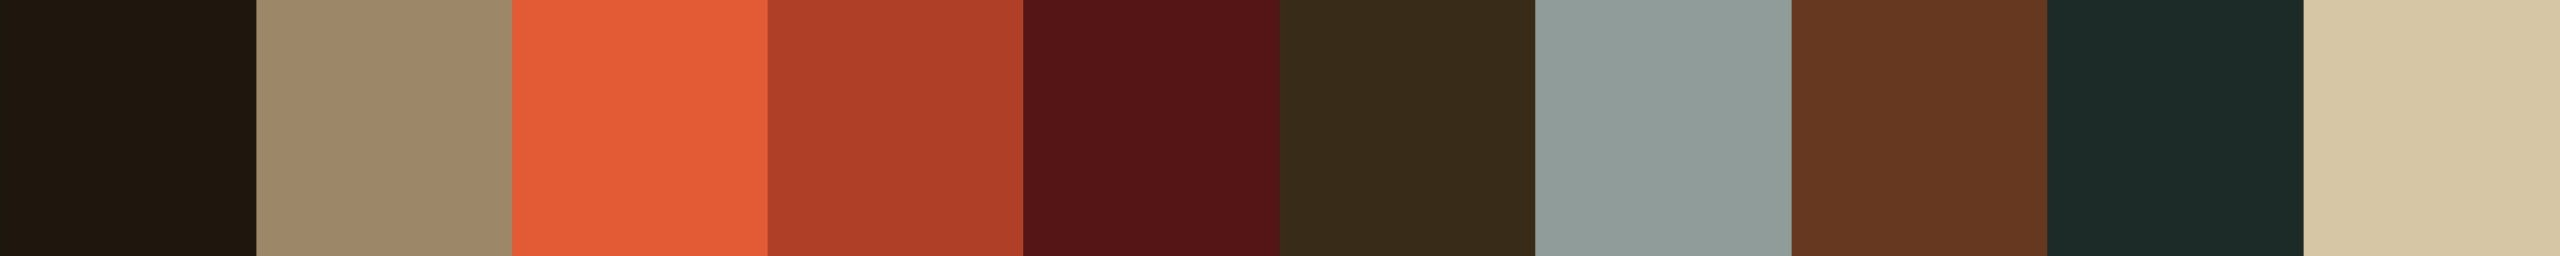 610 Osavodia Color Palette